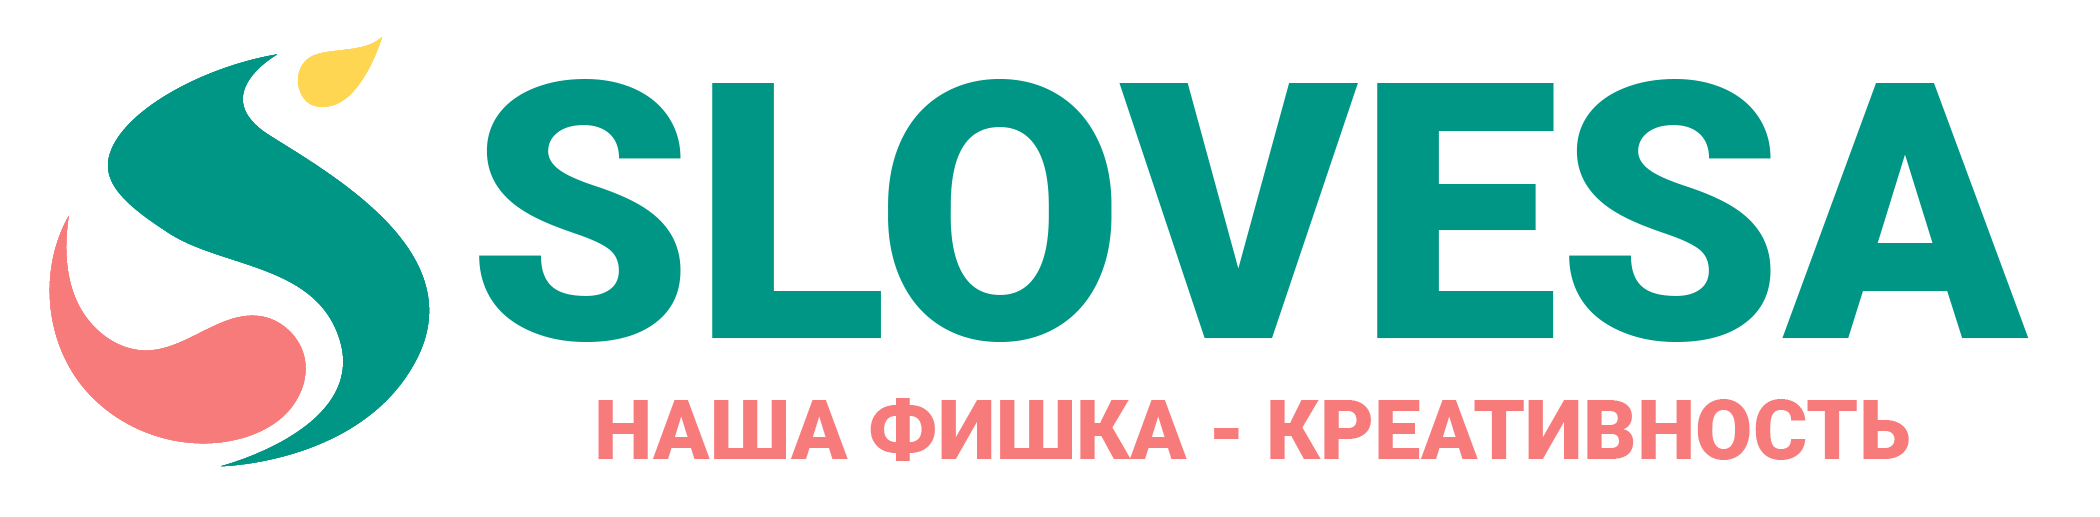 SLOVESA - журнал о развитии